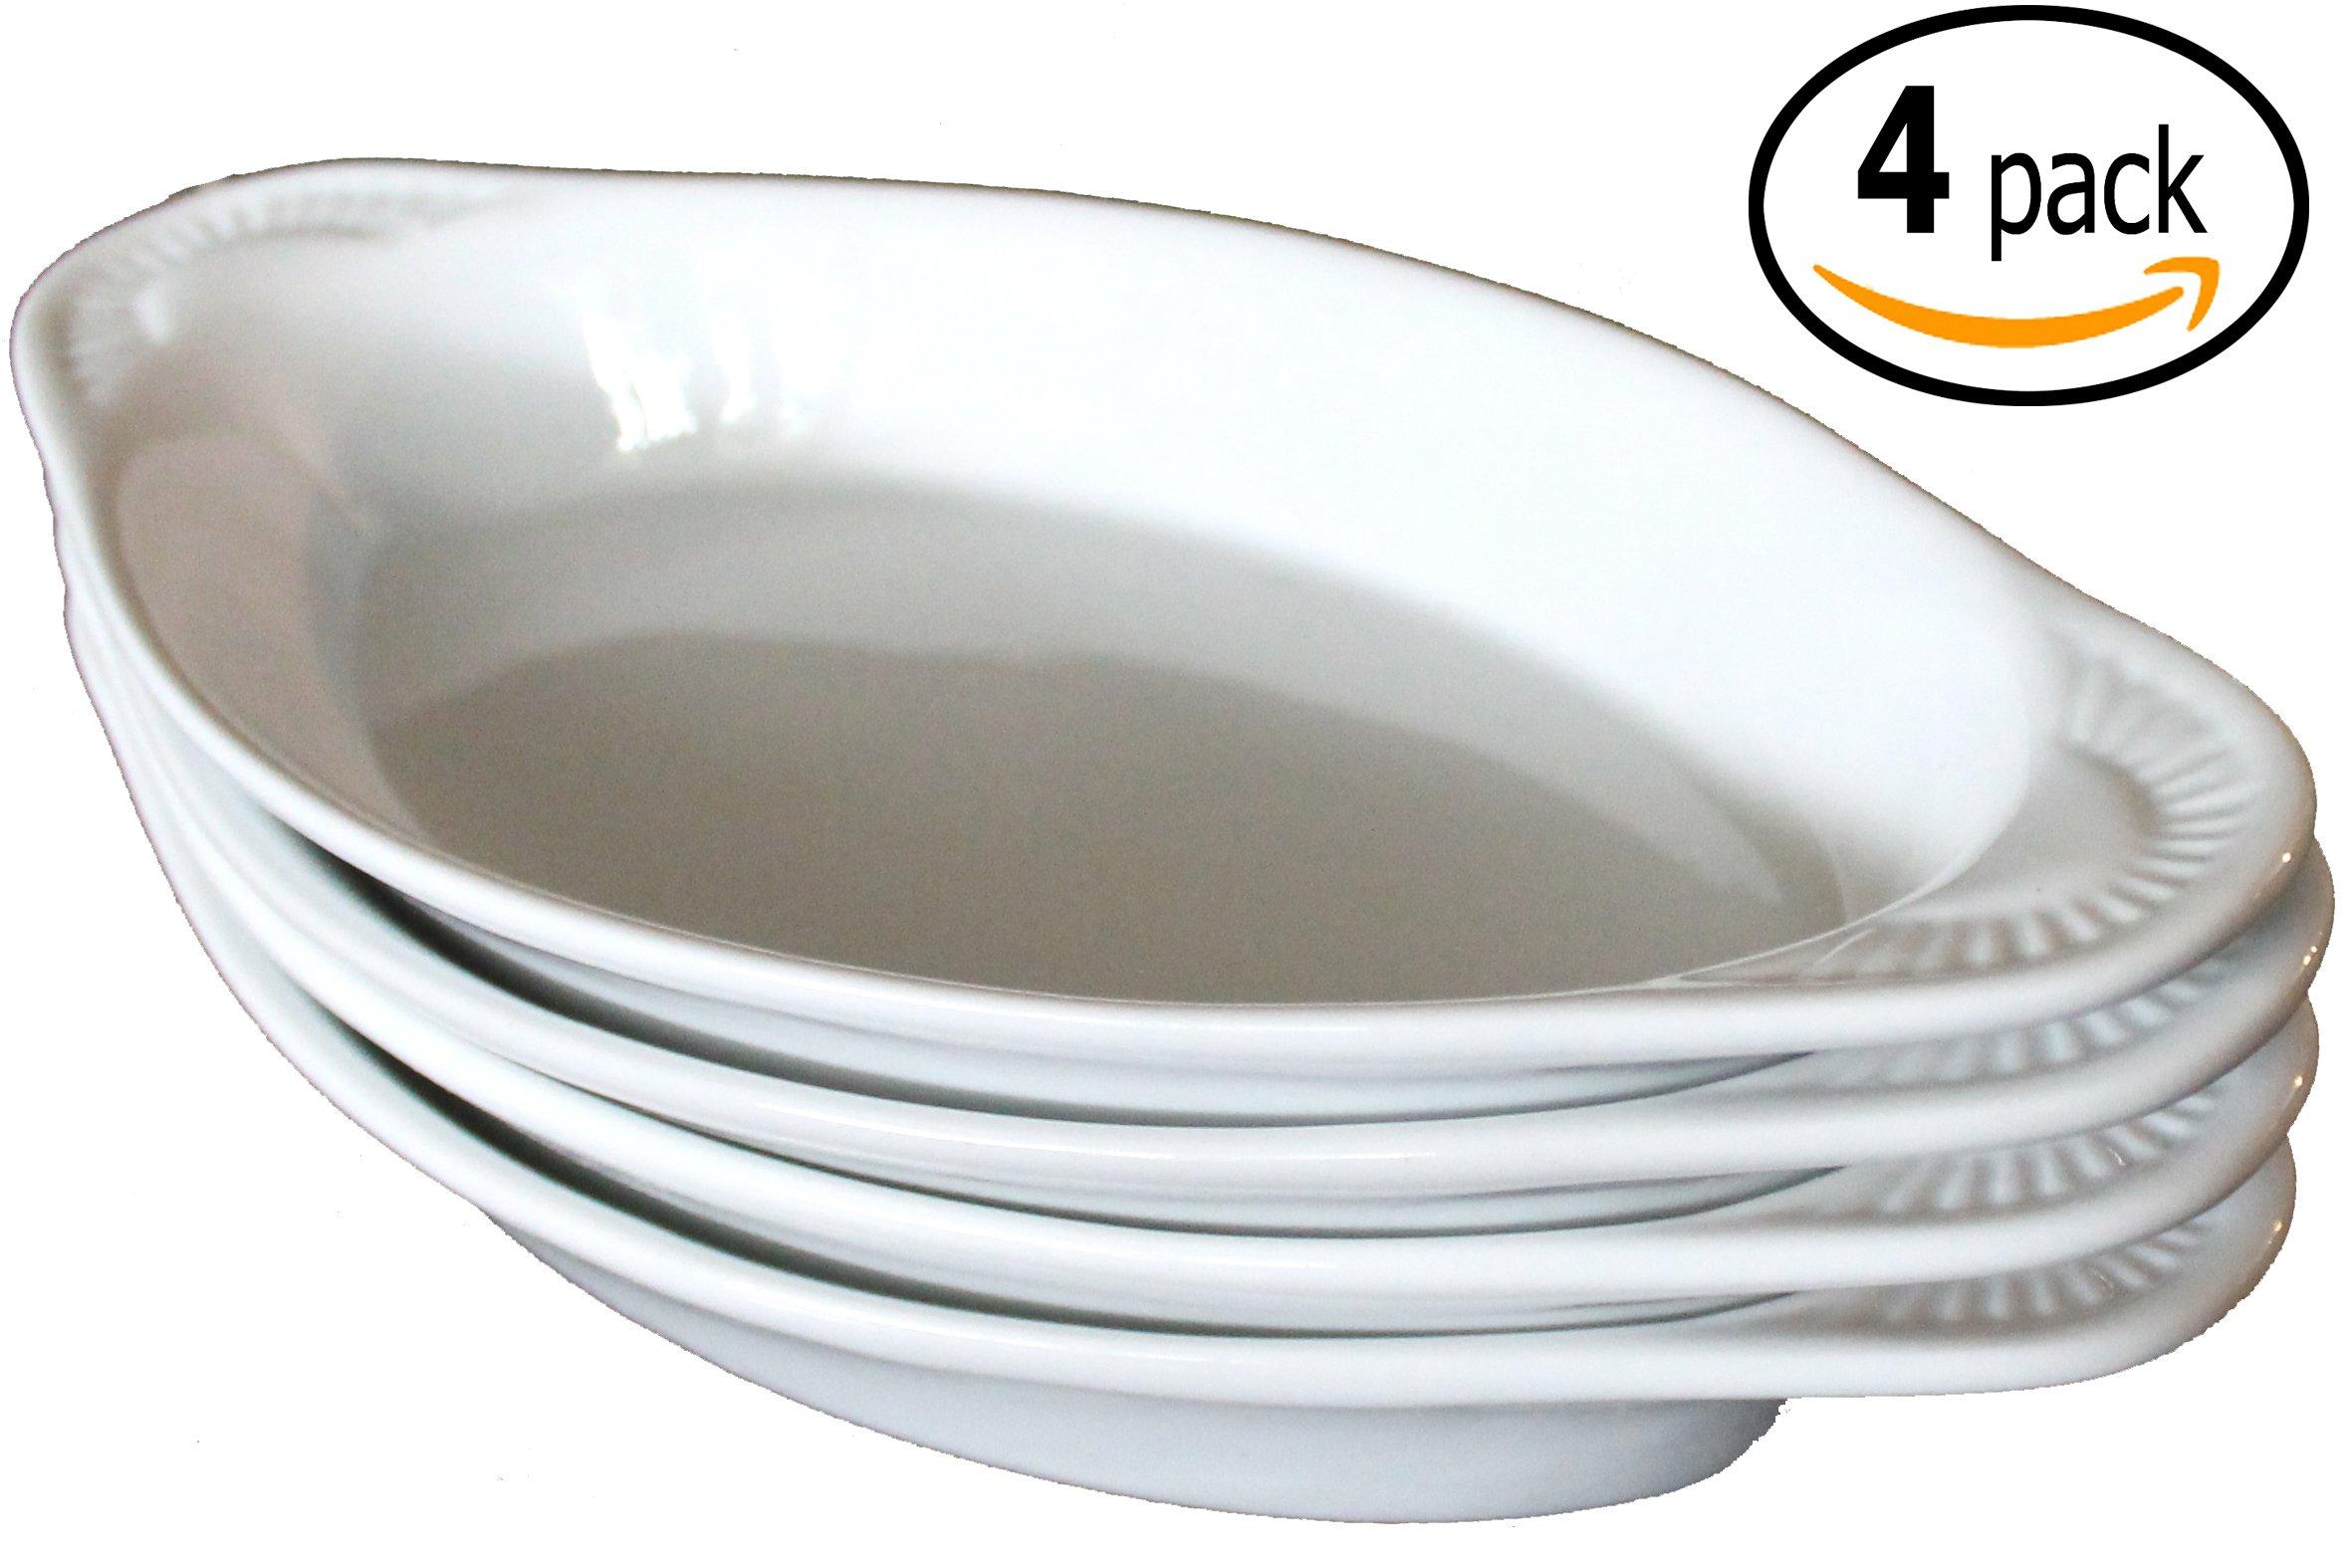 CAC Ceramic Oval Rarebit / Au Gratin Baking Dish with Pan Scraper, Set of 4 (12 Ounce, Pure White)